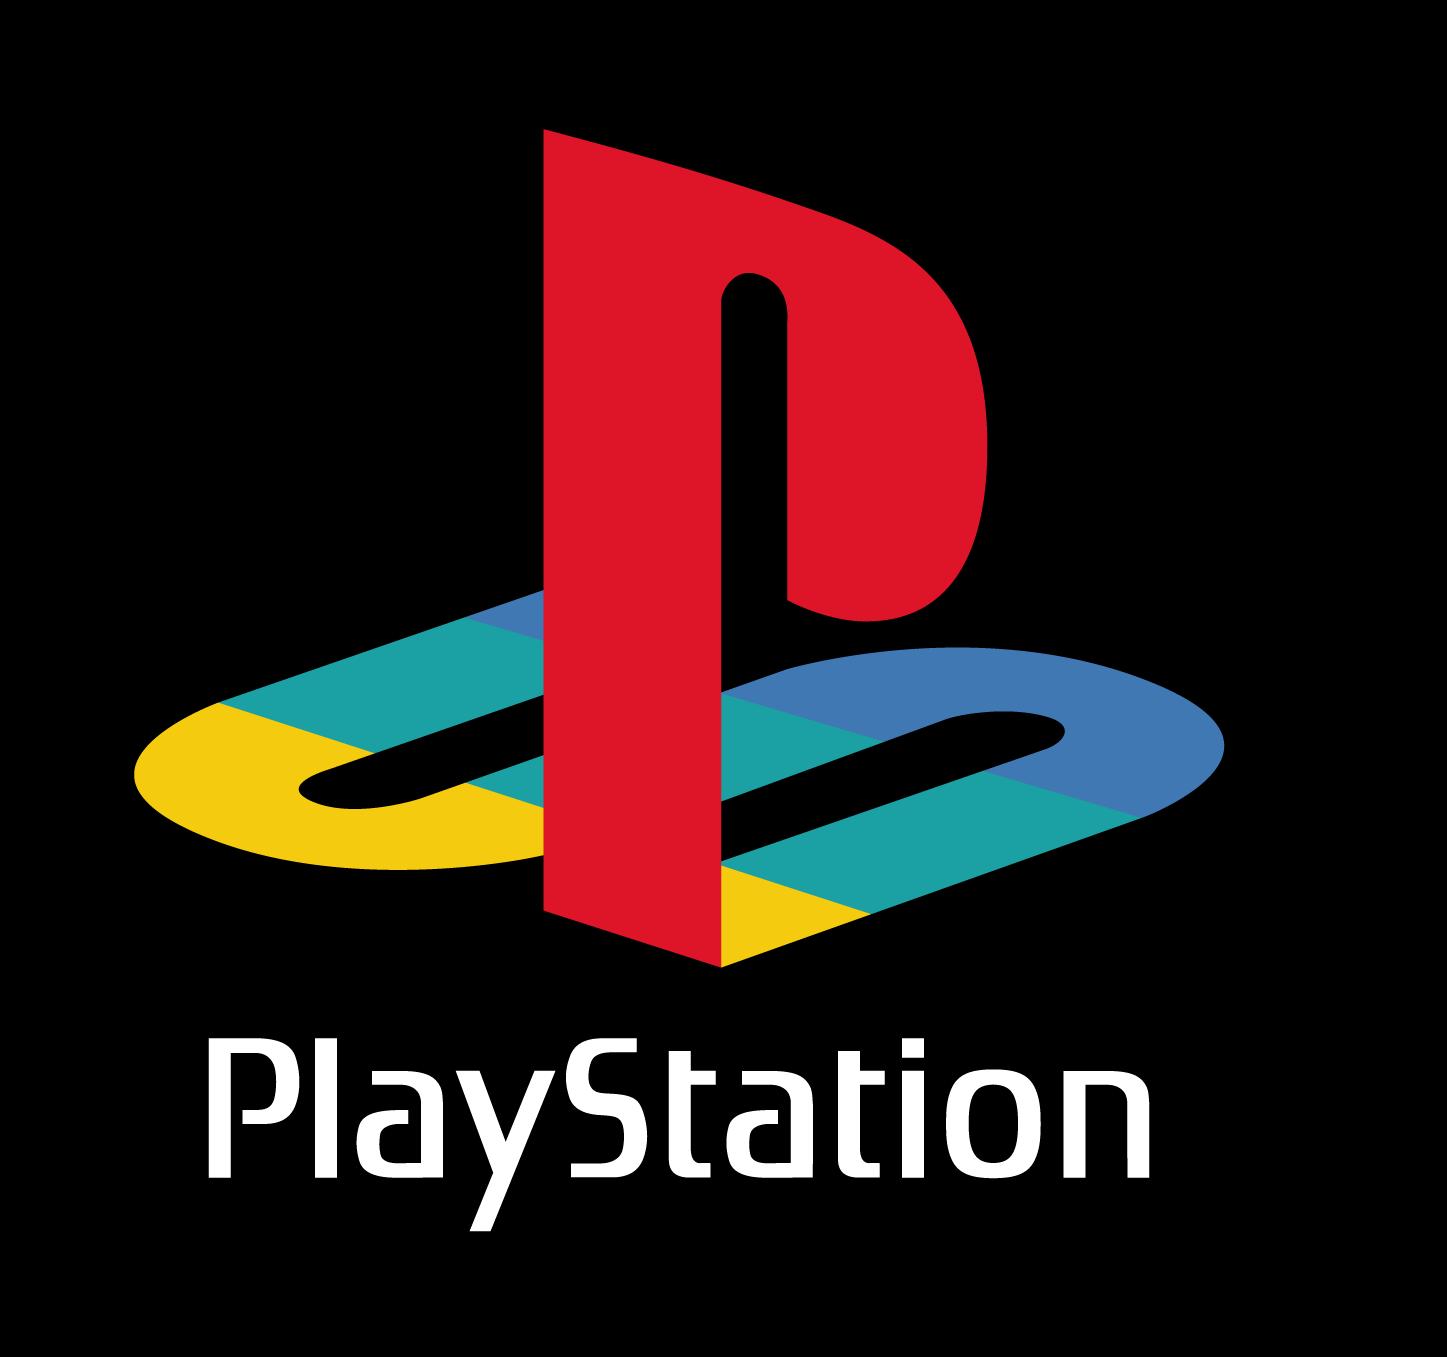 Playstation Phone December 9?